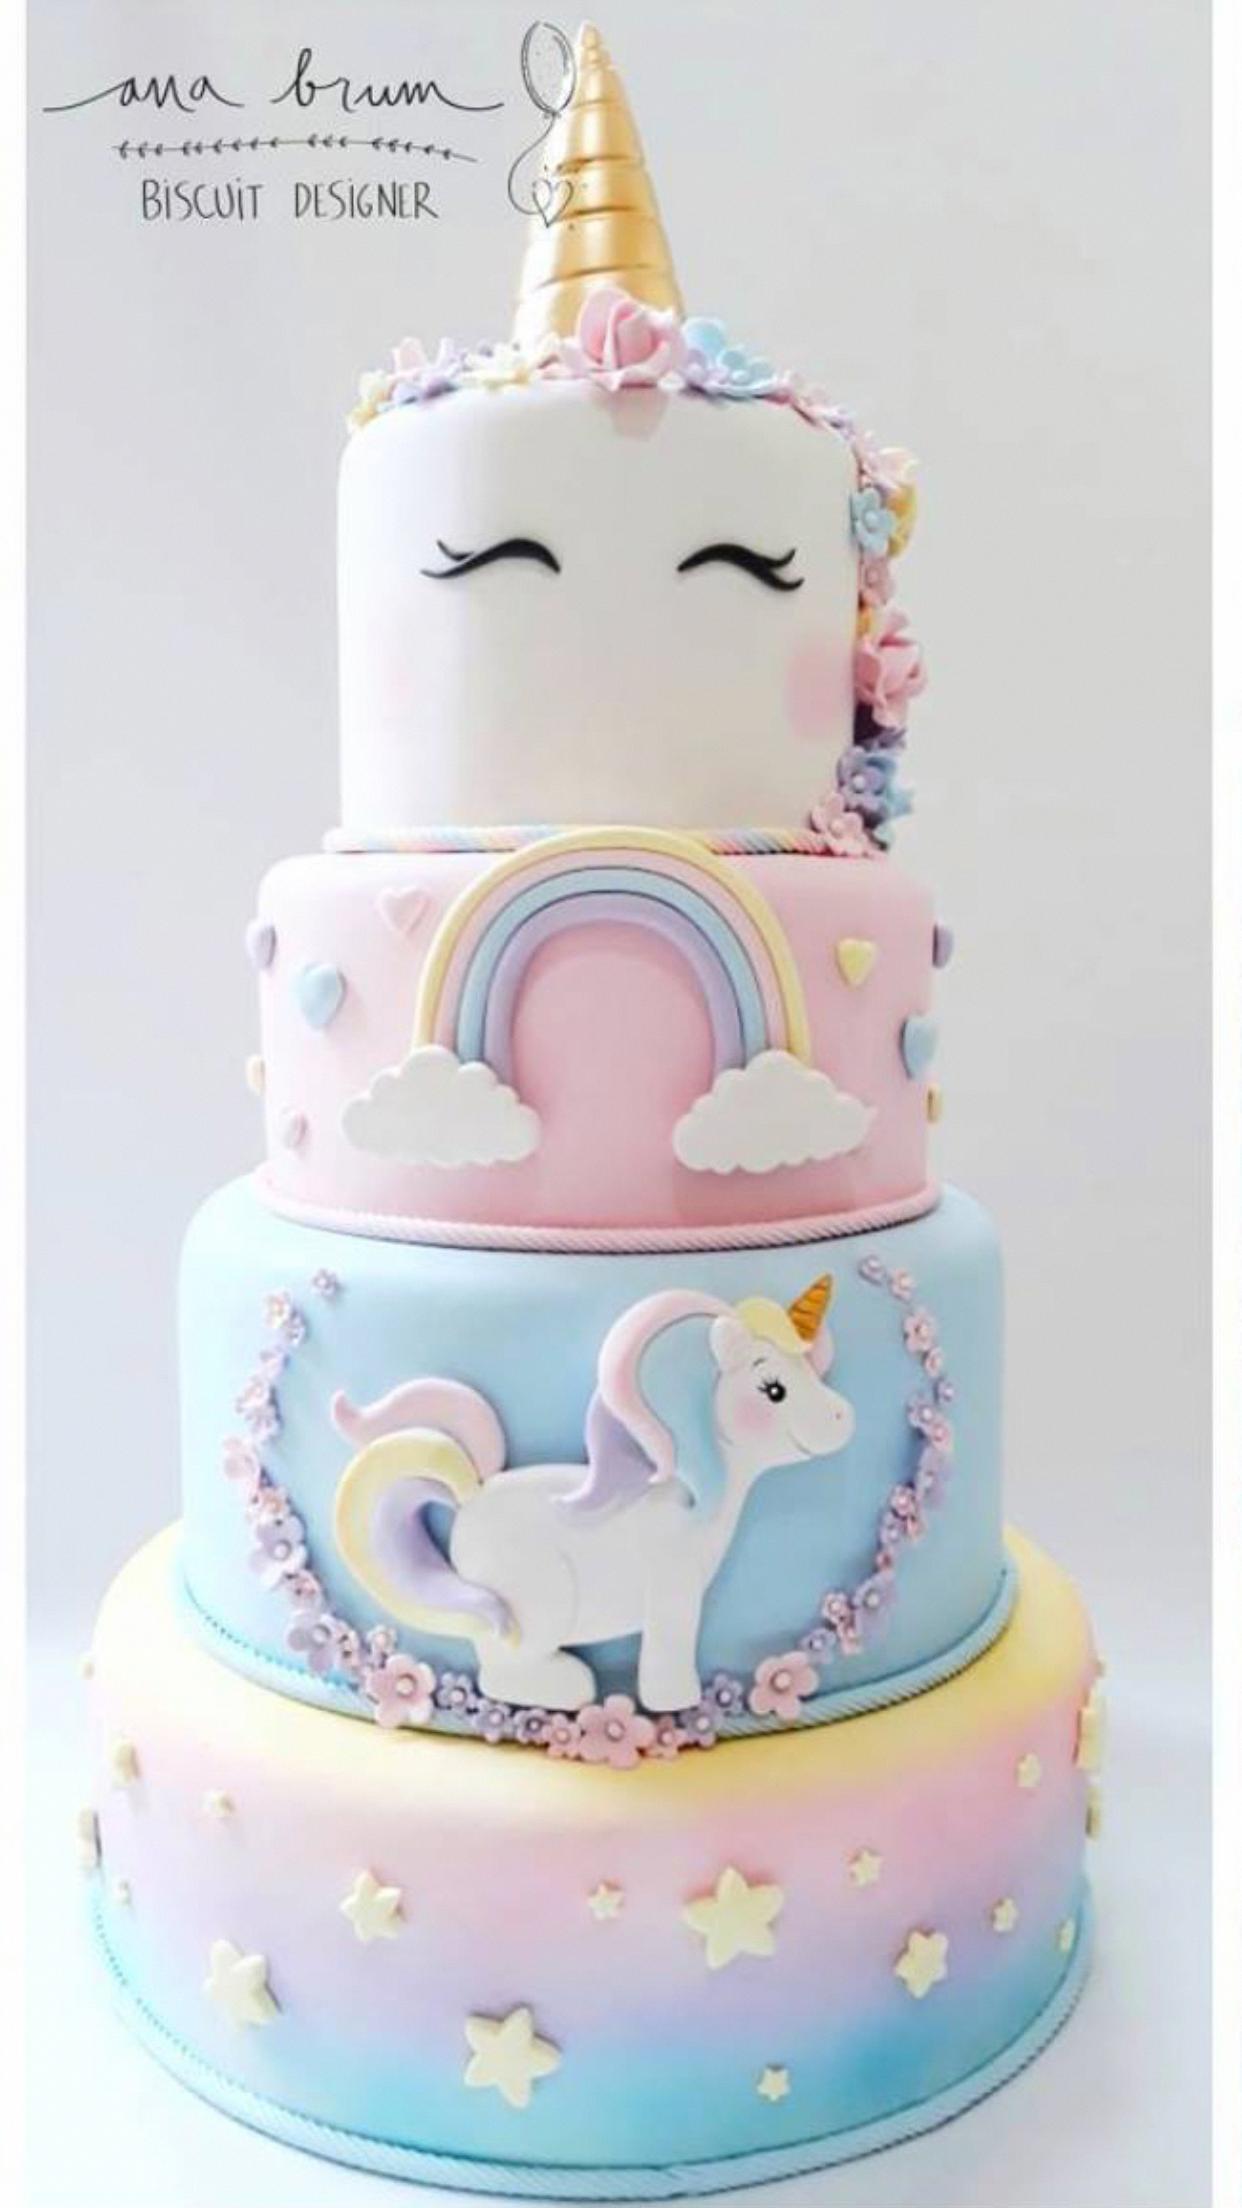 Breton Buckwheat Cake Clean Eating Snacks Recipe In 2020 Unicorn Birthday Cake Birthday Party Cake Cake Designs Birthday